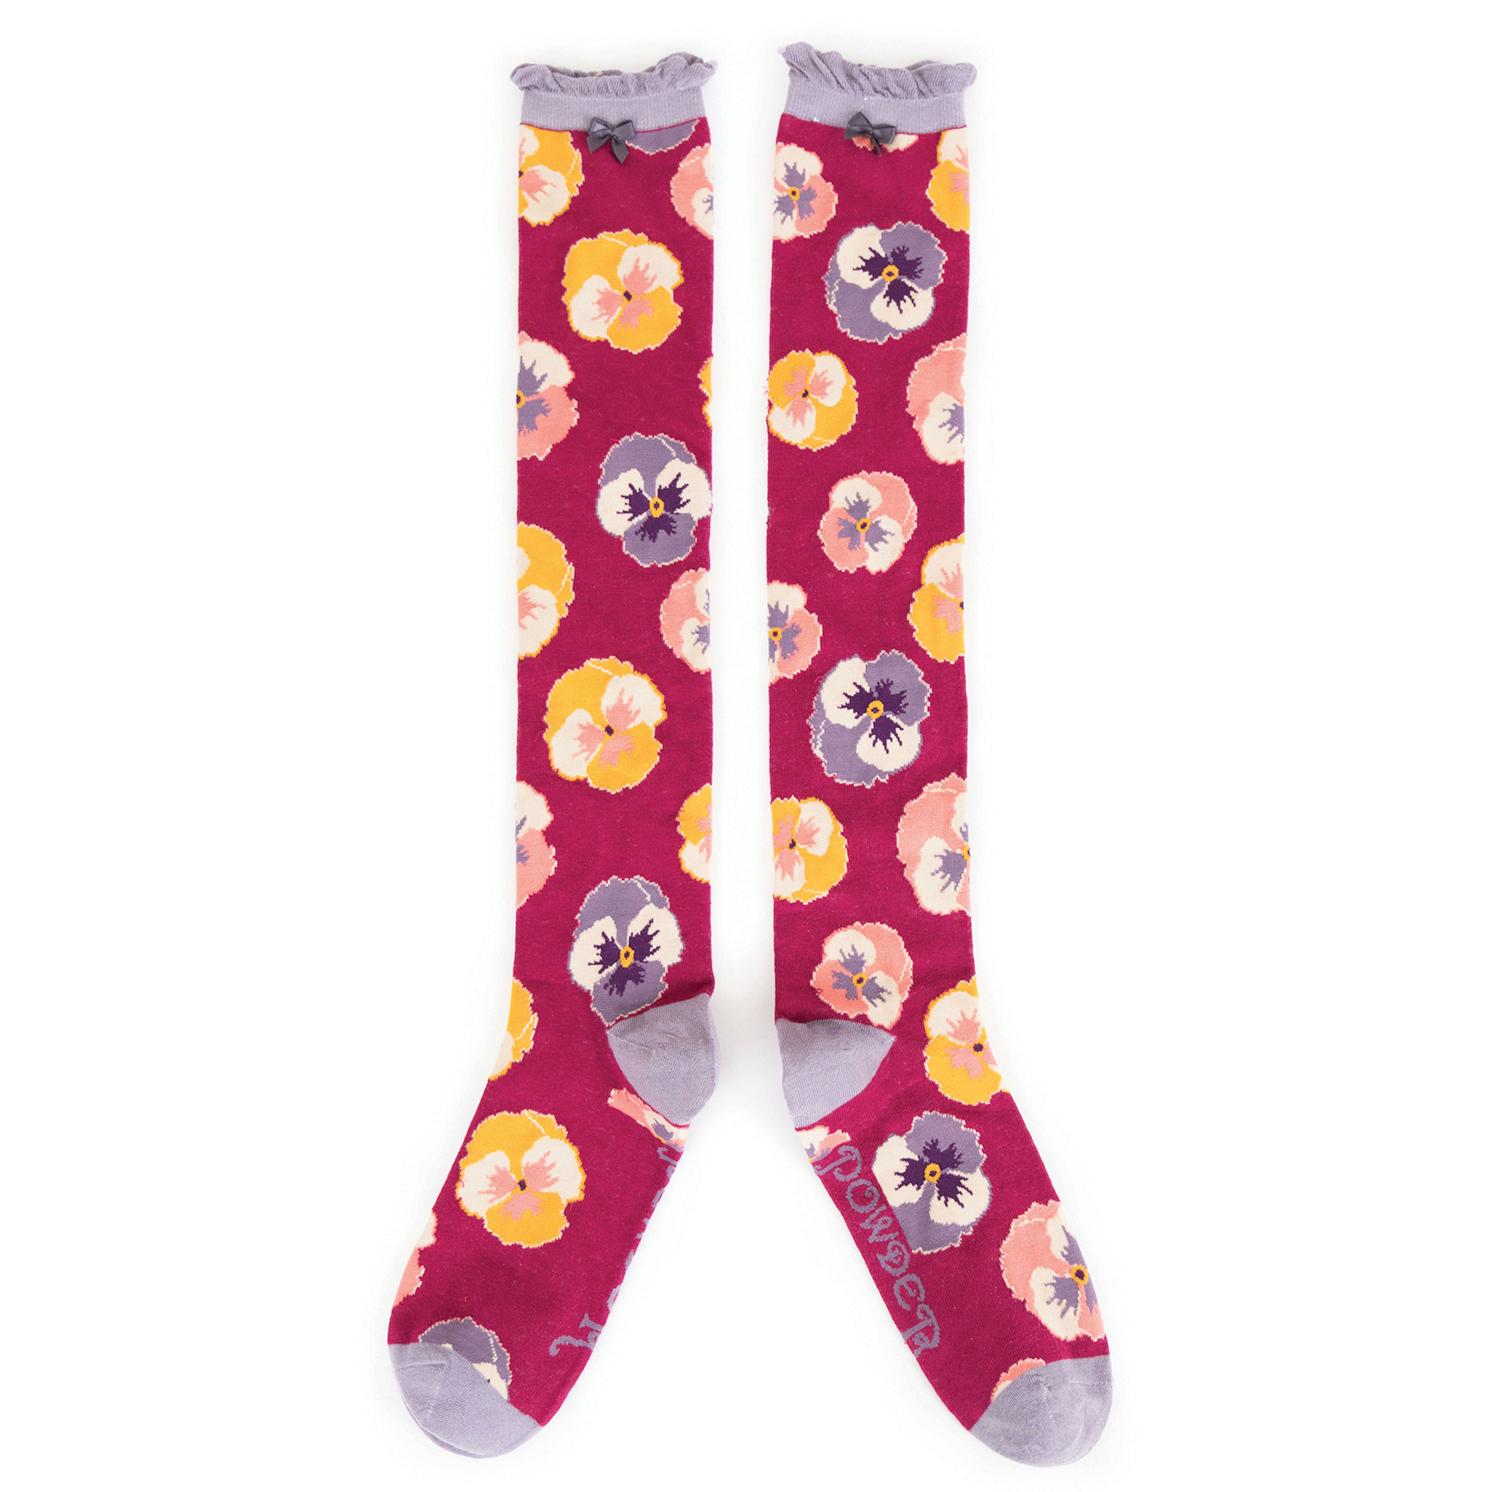 Powder – Fuchsia Pansy Knee High Socks with Presentation Gift Bag